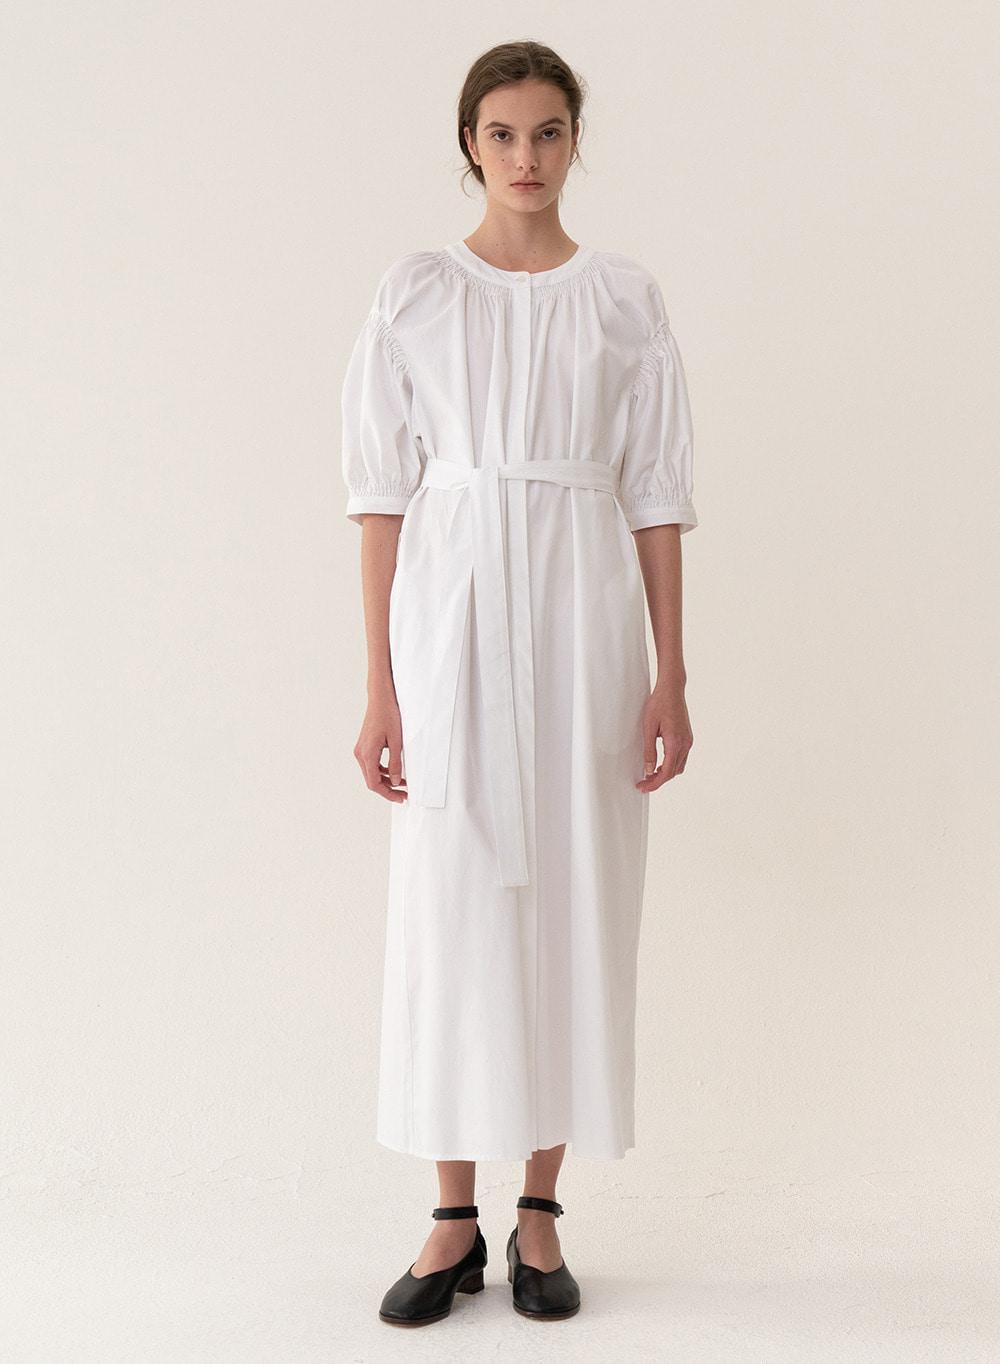 [ESSENTIAL] Original Balloon Dress White